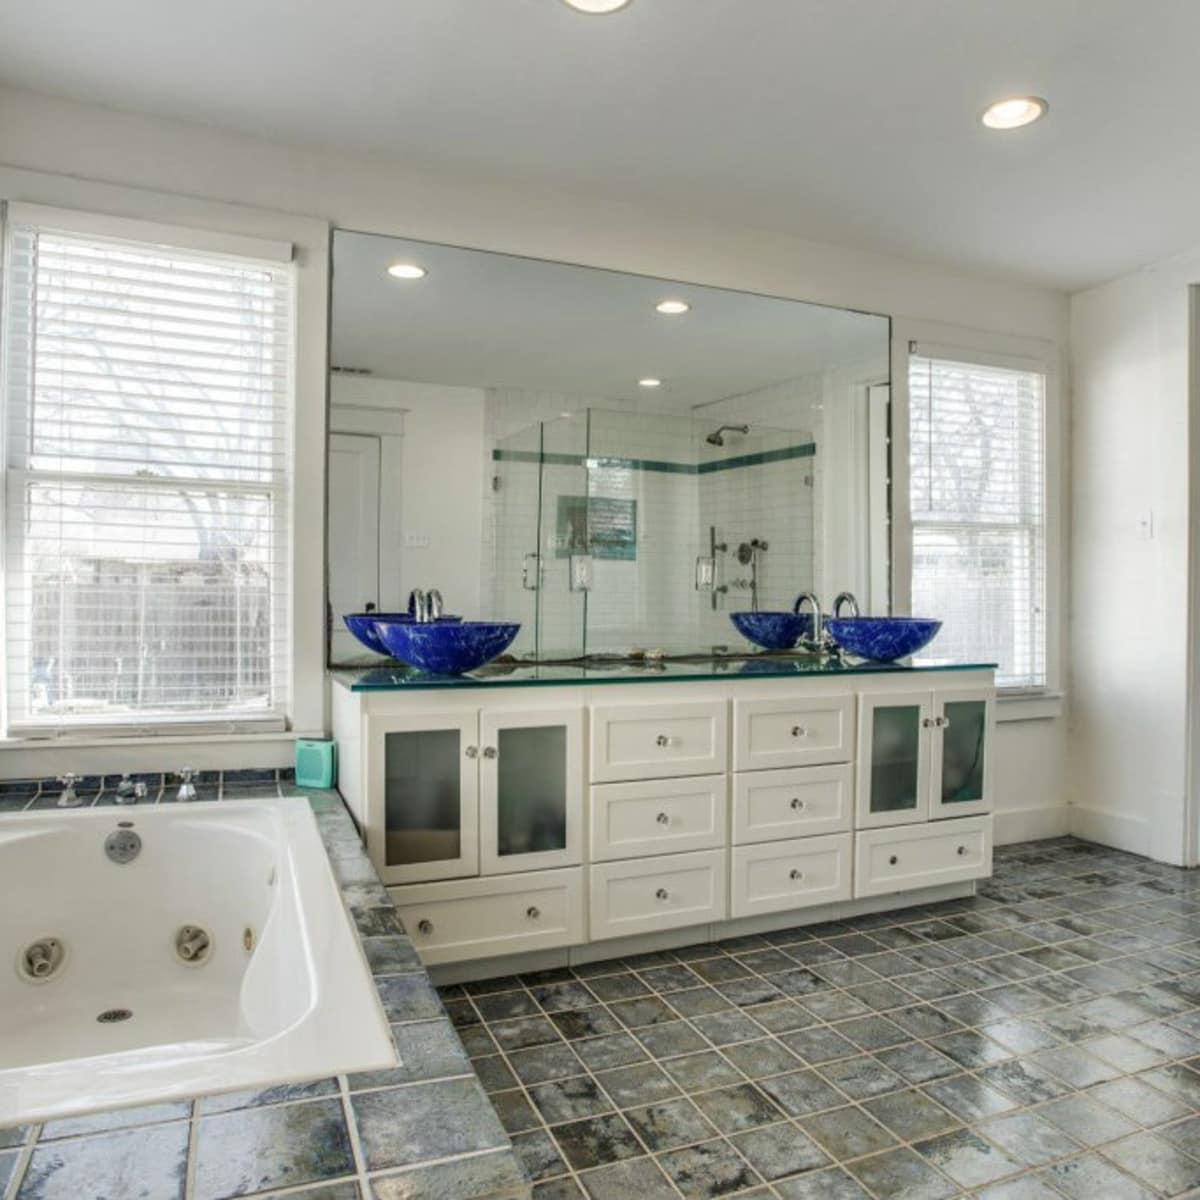 118 N. Winnetka master bathroom